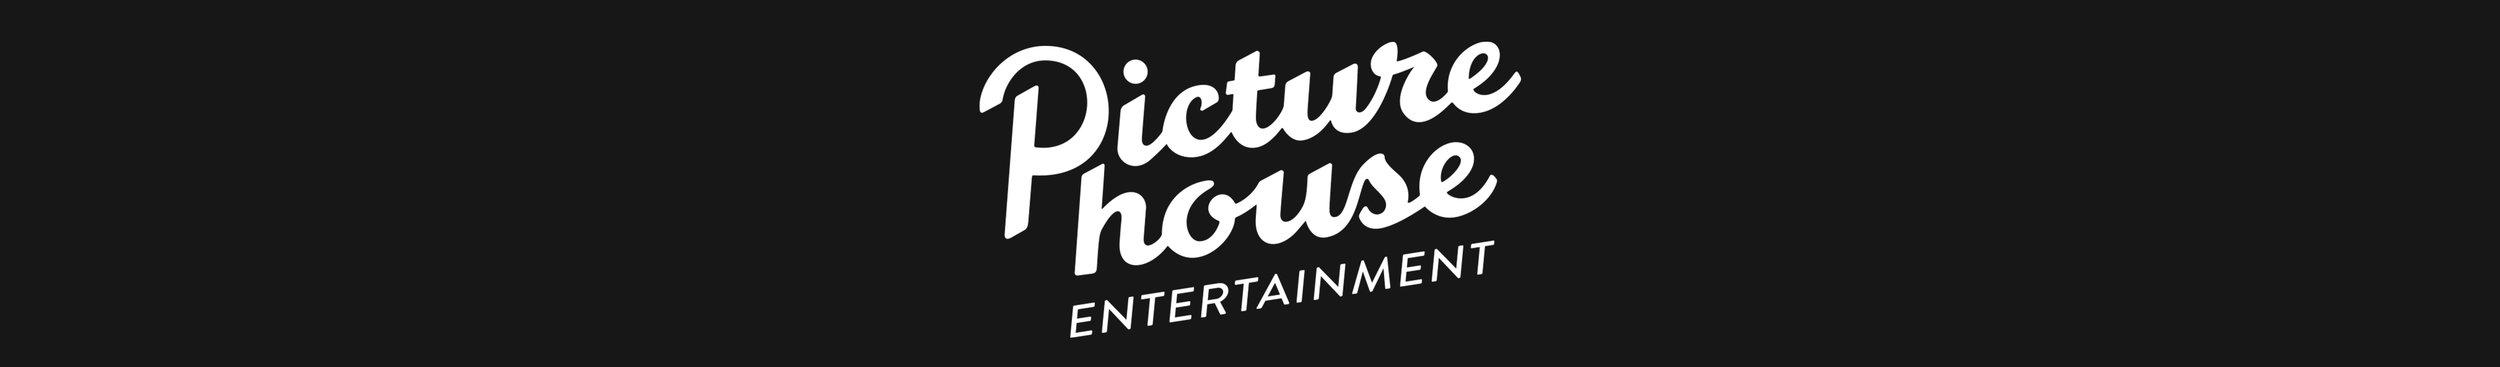 IntWebsite_Clients_White_Picturehouse.jpg